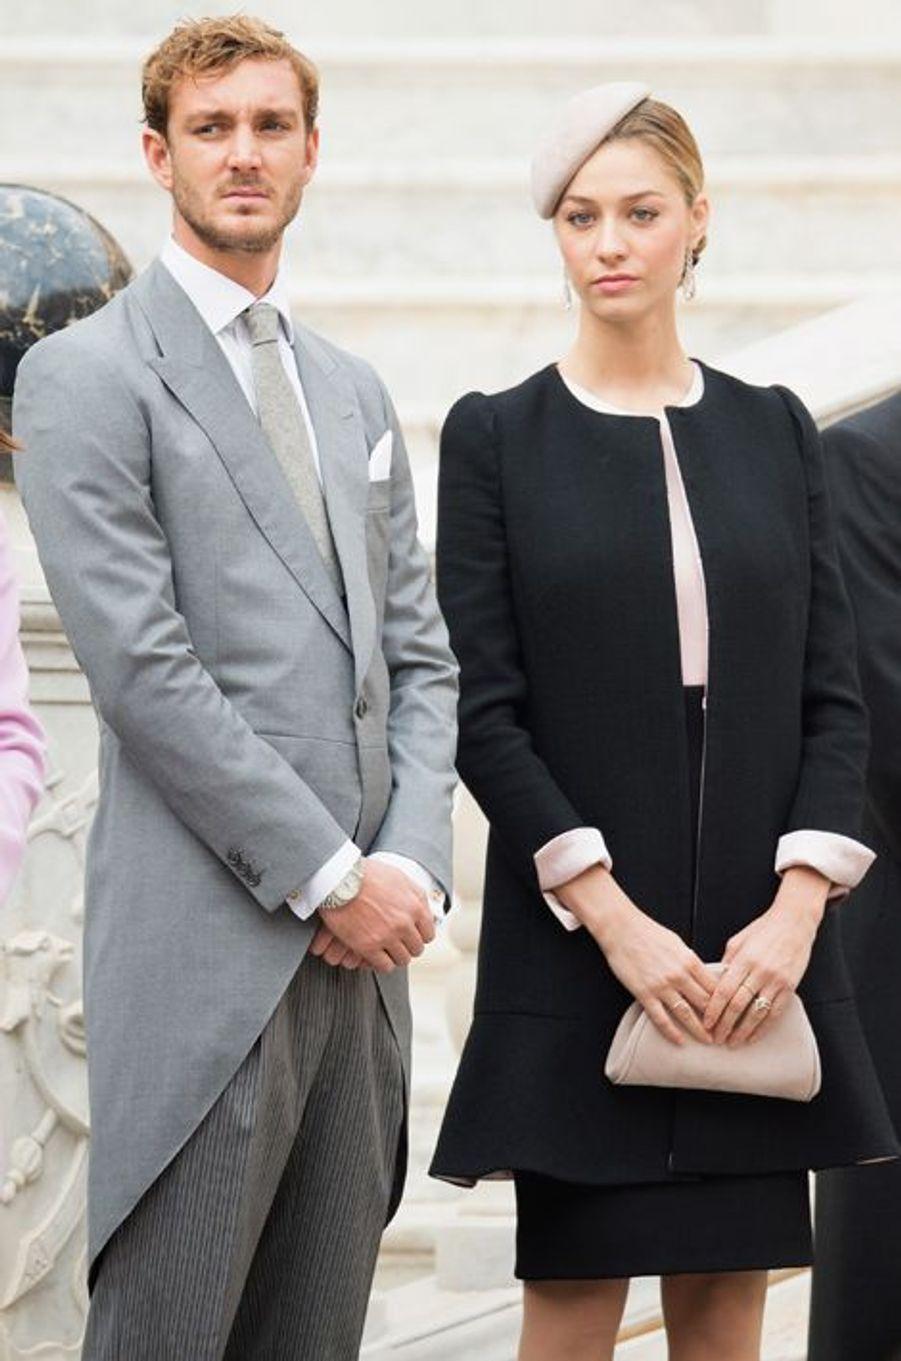 Pierre Casiraghi et sa femme Beatrice Borromeo à Monaco, le 19 novembre 2015